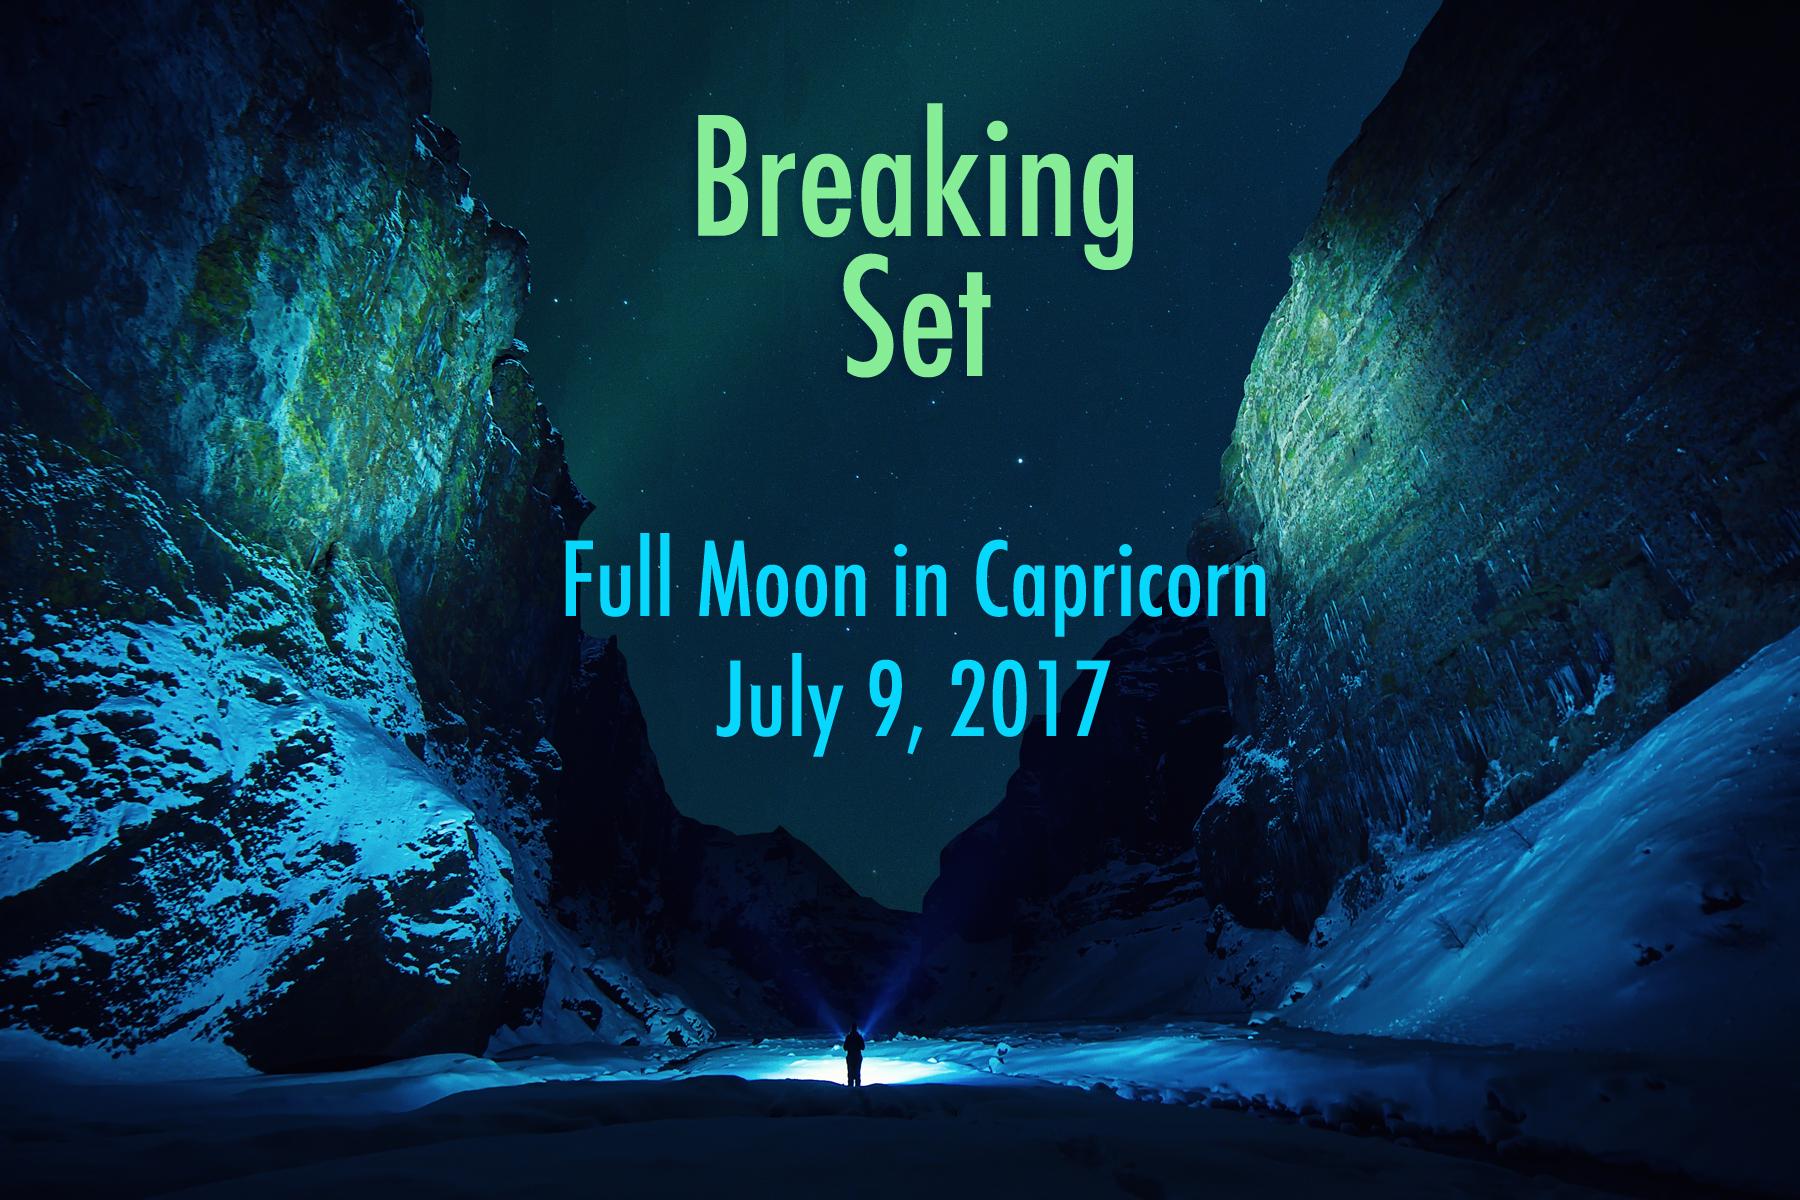 Full Moon in Capricorn: Breaking Set